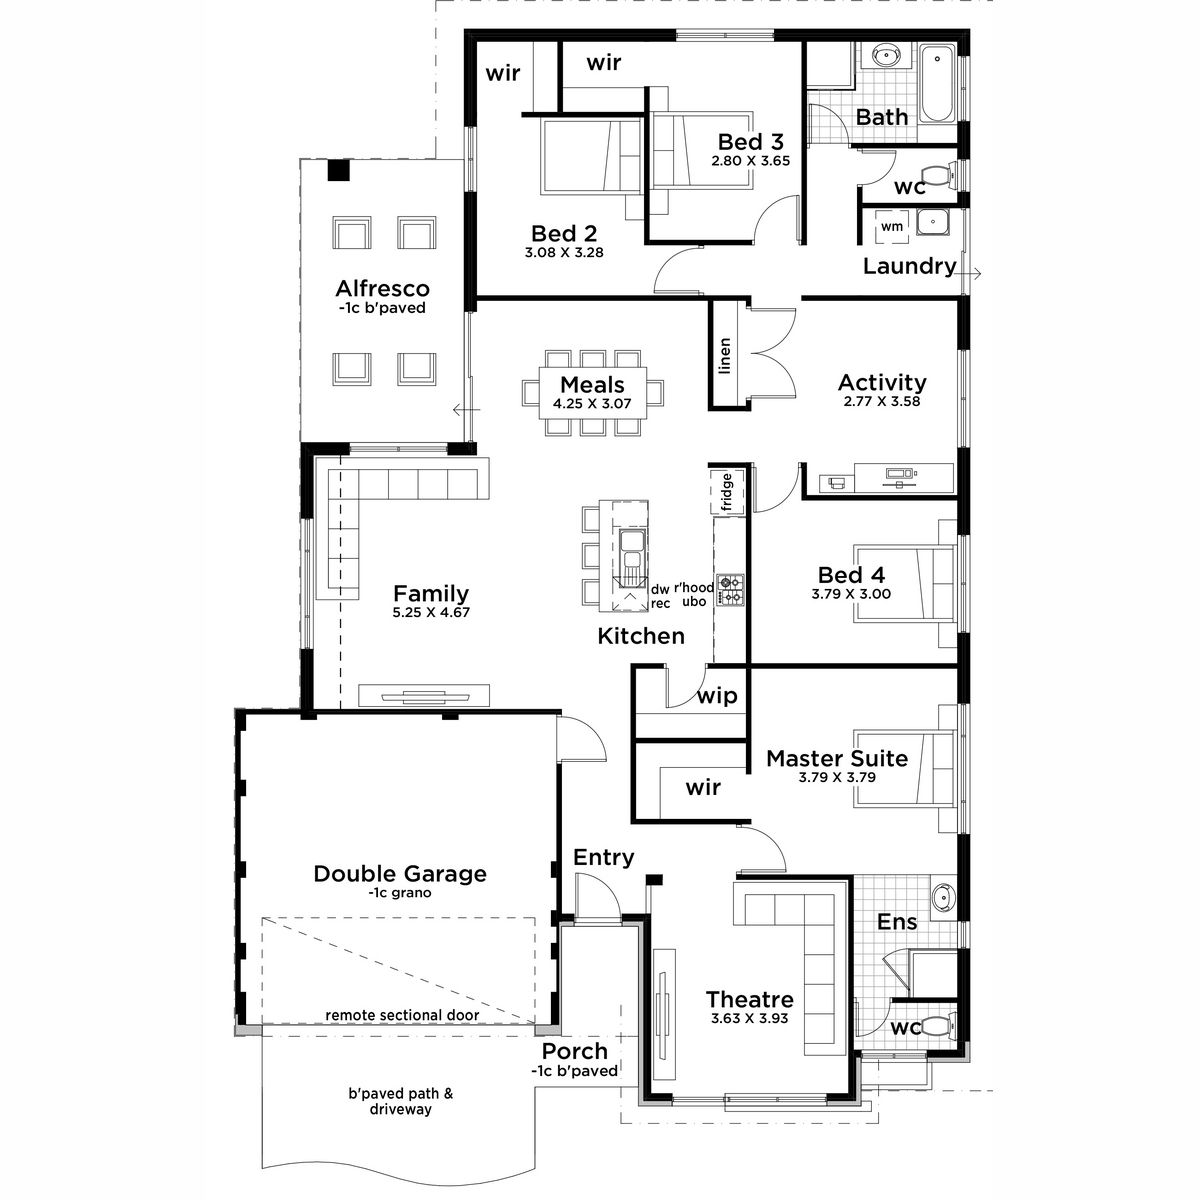 Dispozice Domu Image By Marta Kracmerova Floor Plans Sectional